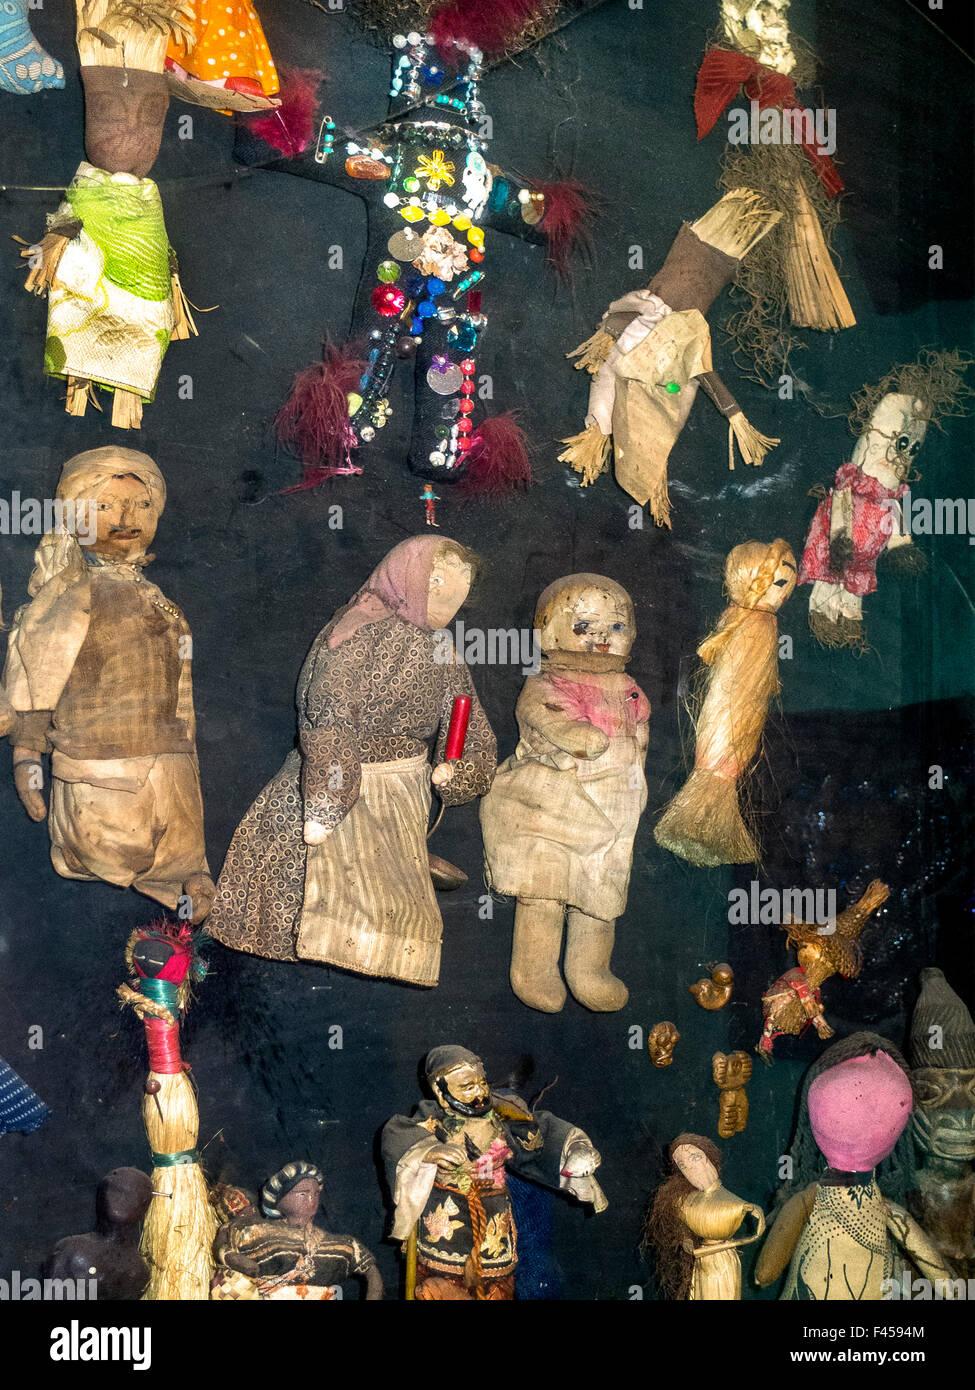 Voodoopuppen geglaubt, um böse Zauberkräfte haben werden im New Orleans Voodoo Museum angezeigt. Beachten Stockbild